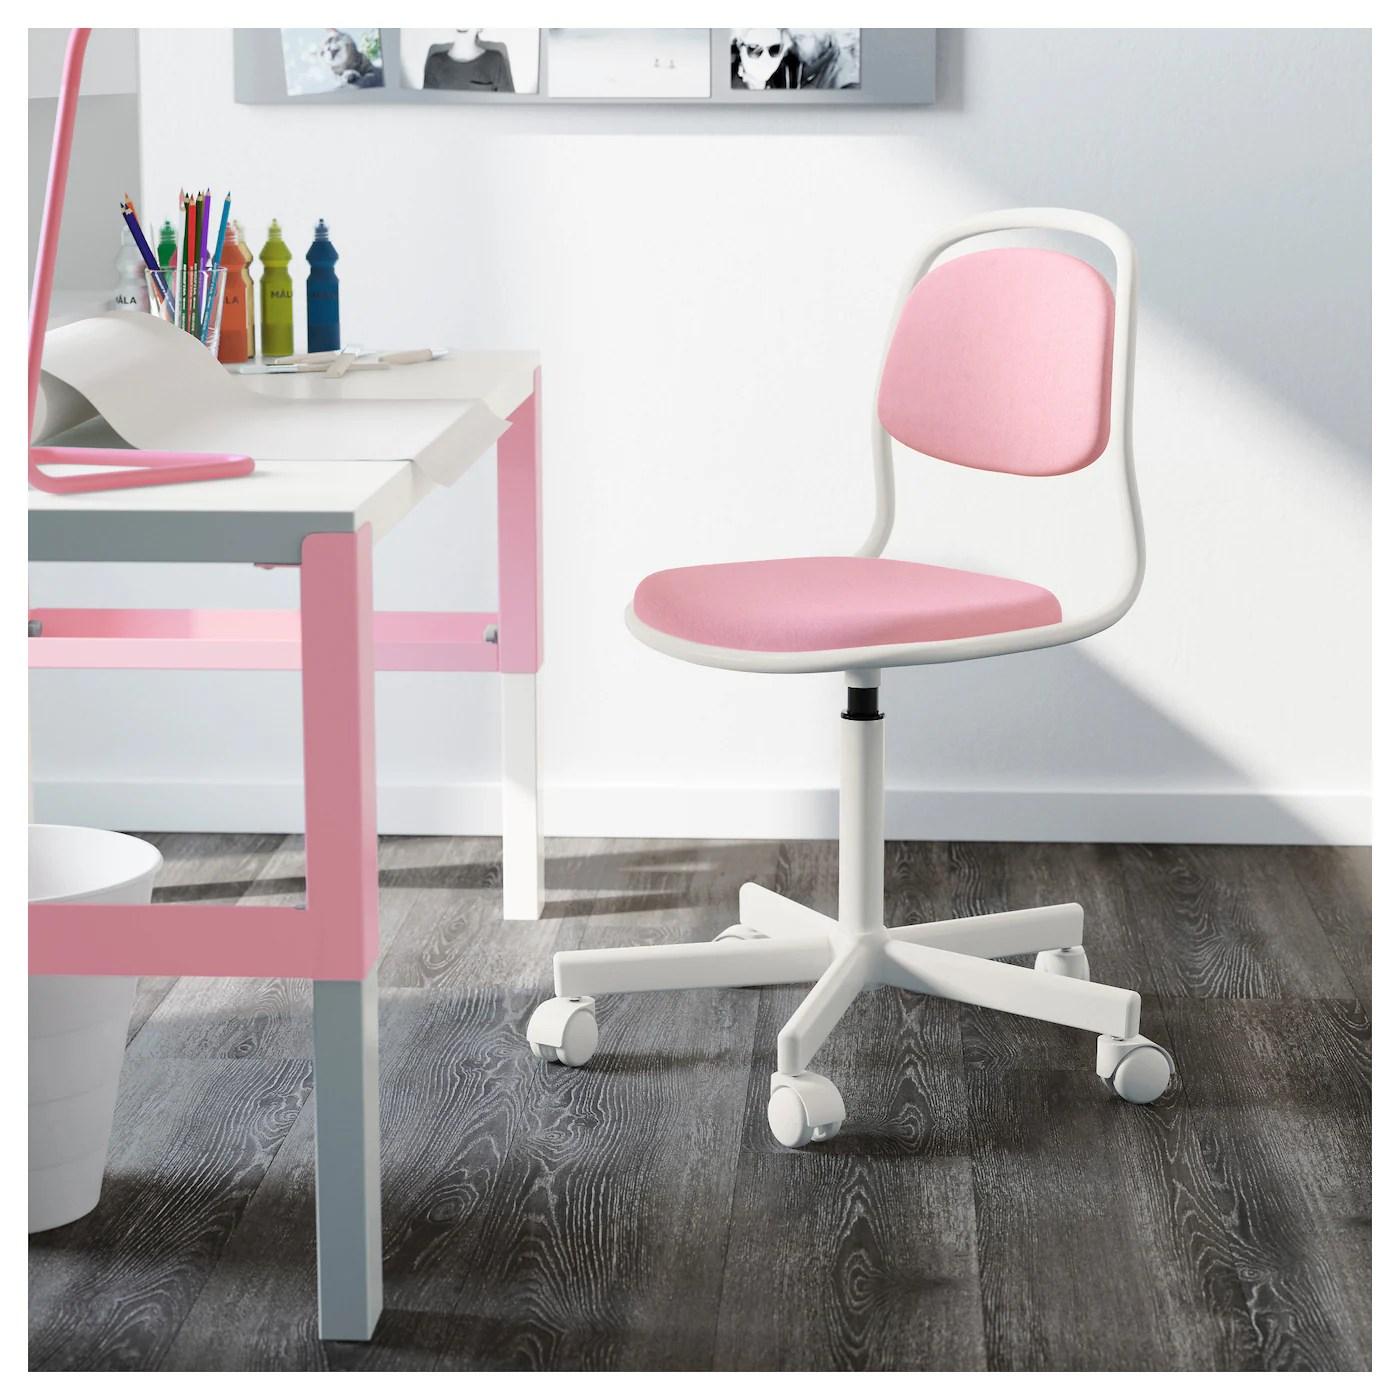 ikea junior desk chair fishing with canopy ÖrfjÄll children 39s white vissle pink